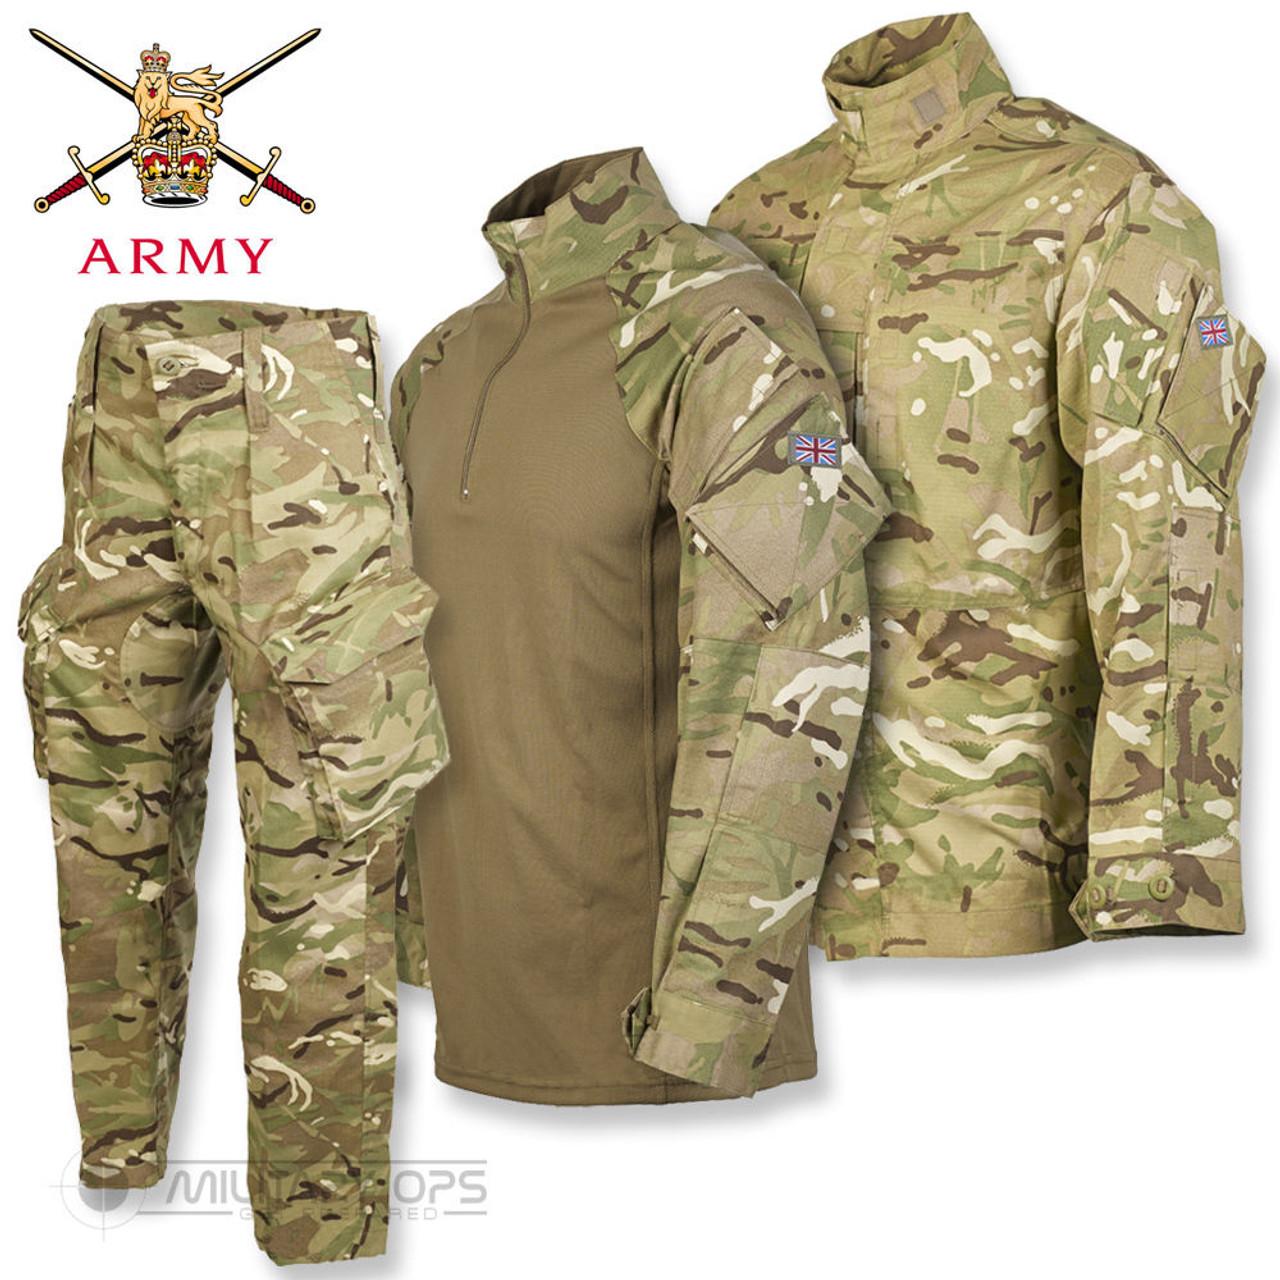 GENUINE ISSUE GRADE ONE BRITISH ARMY UNIFORM BUTTON 95 STYLE SHIRT MTP